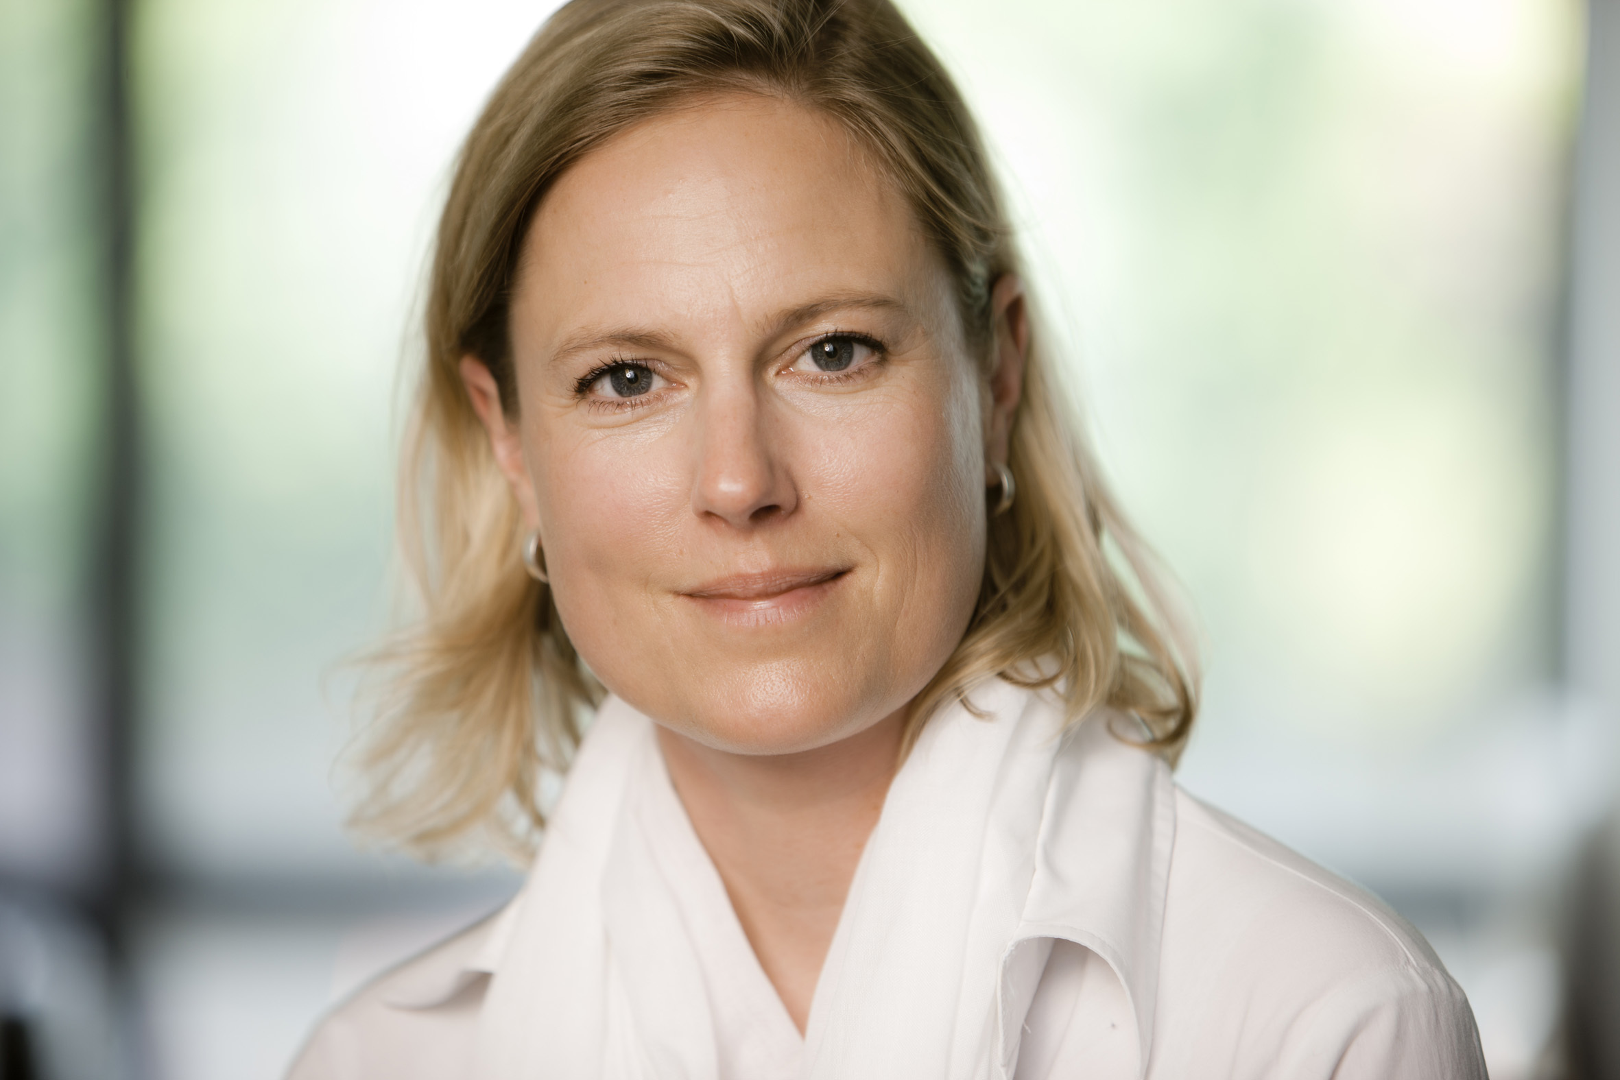 Jutta Hillen Innenarchitektur Innenarchitekten in Neuss   homify